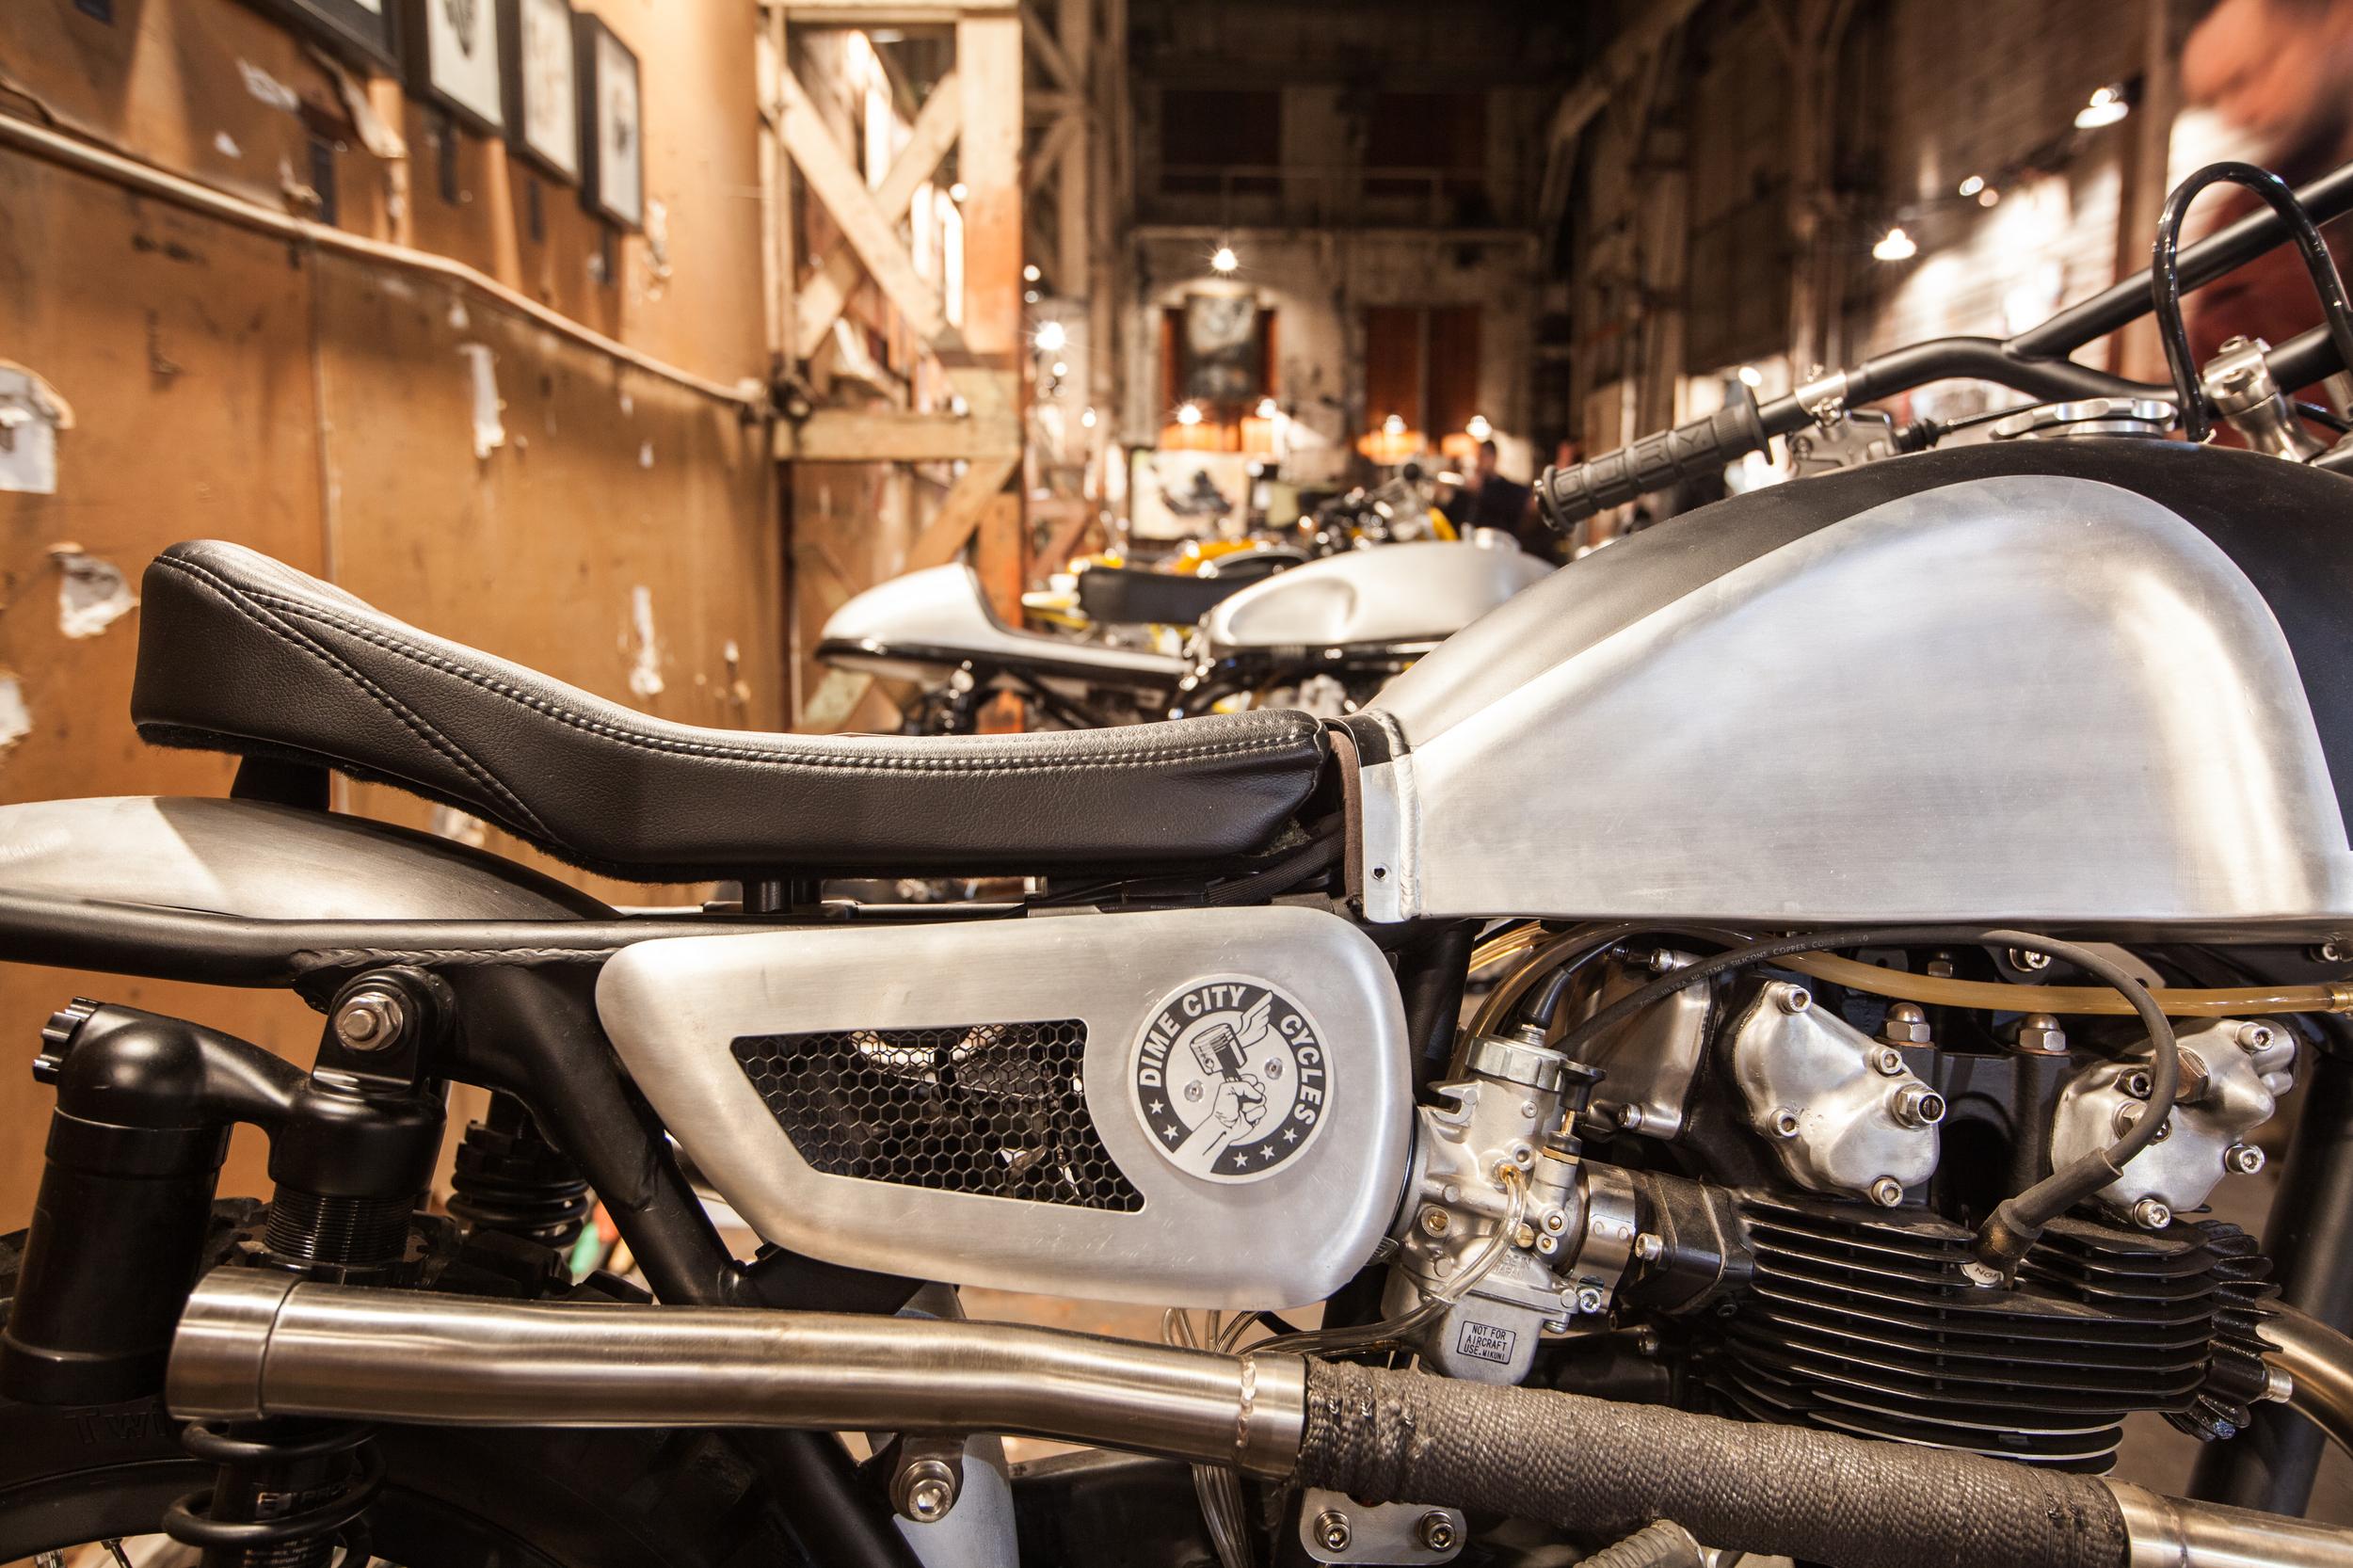 02-14-15 The 1 Moto Show - 2_-65-33.jpg